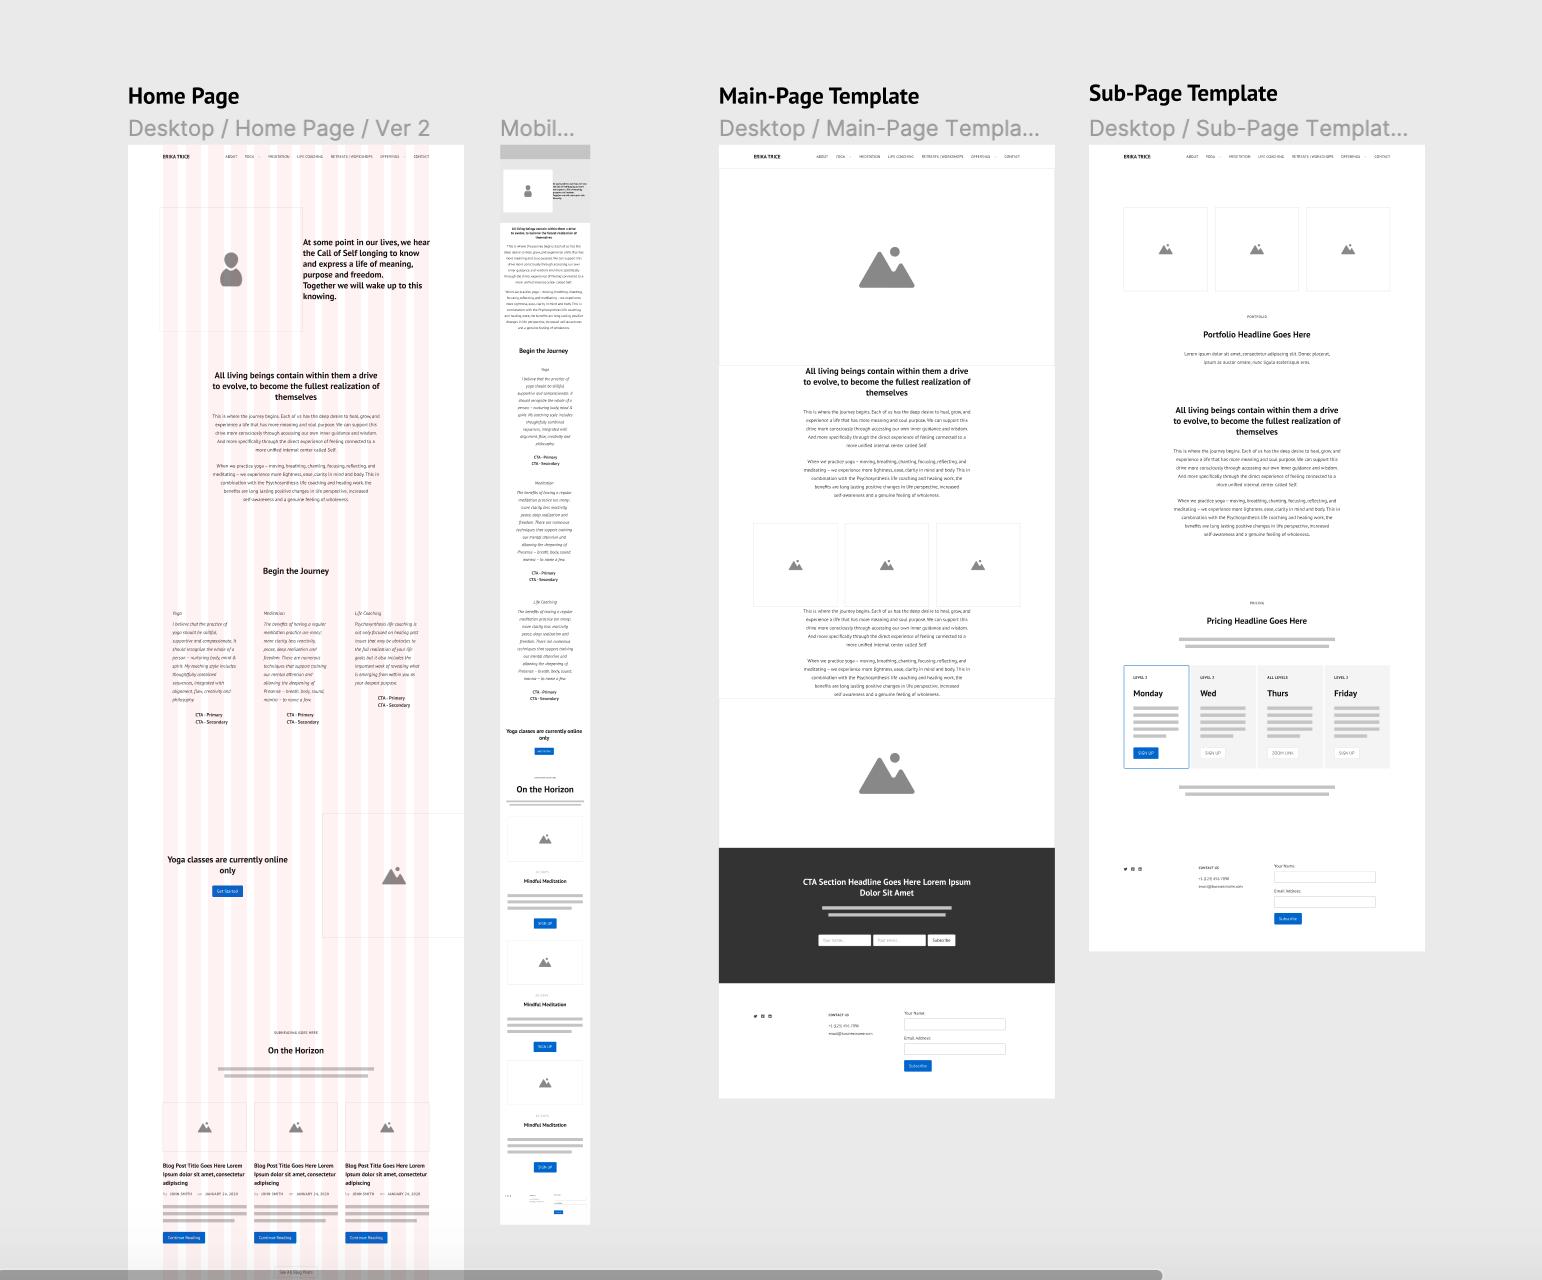 Responsive wireframes for client's website design